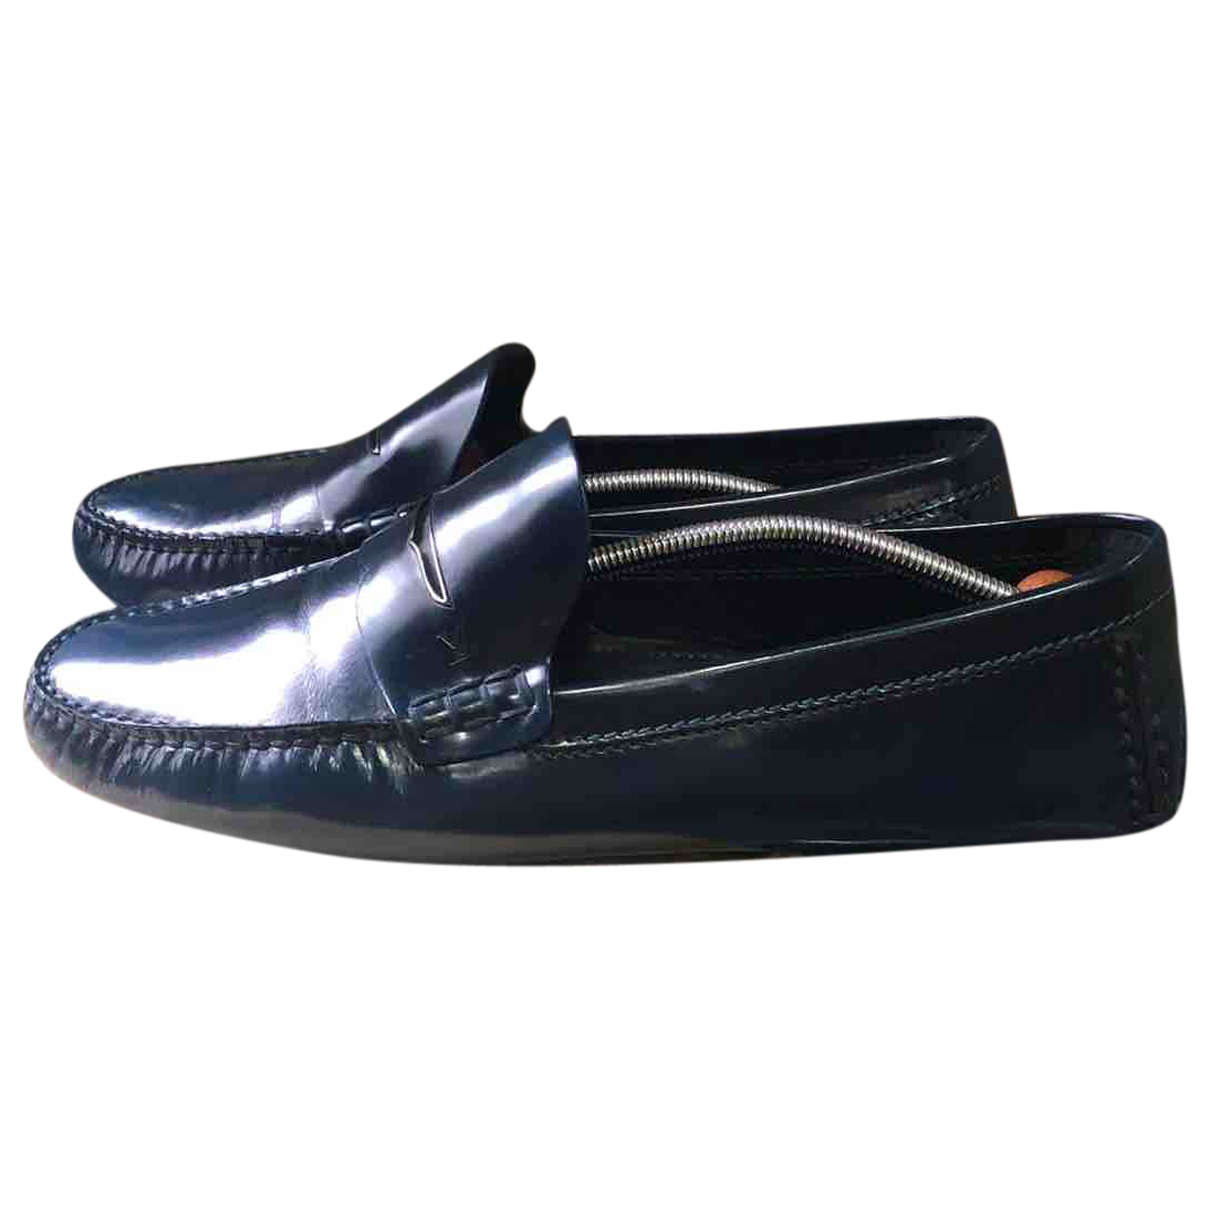 Louis Vuitton Montaigne Navy Leather Flats for Men 44 EU